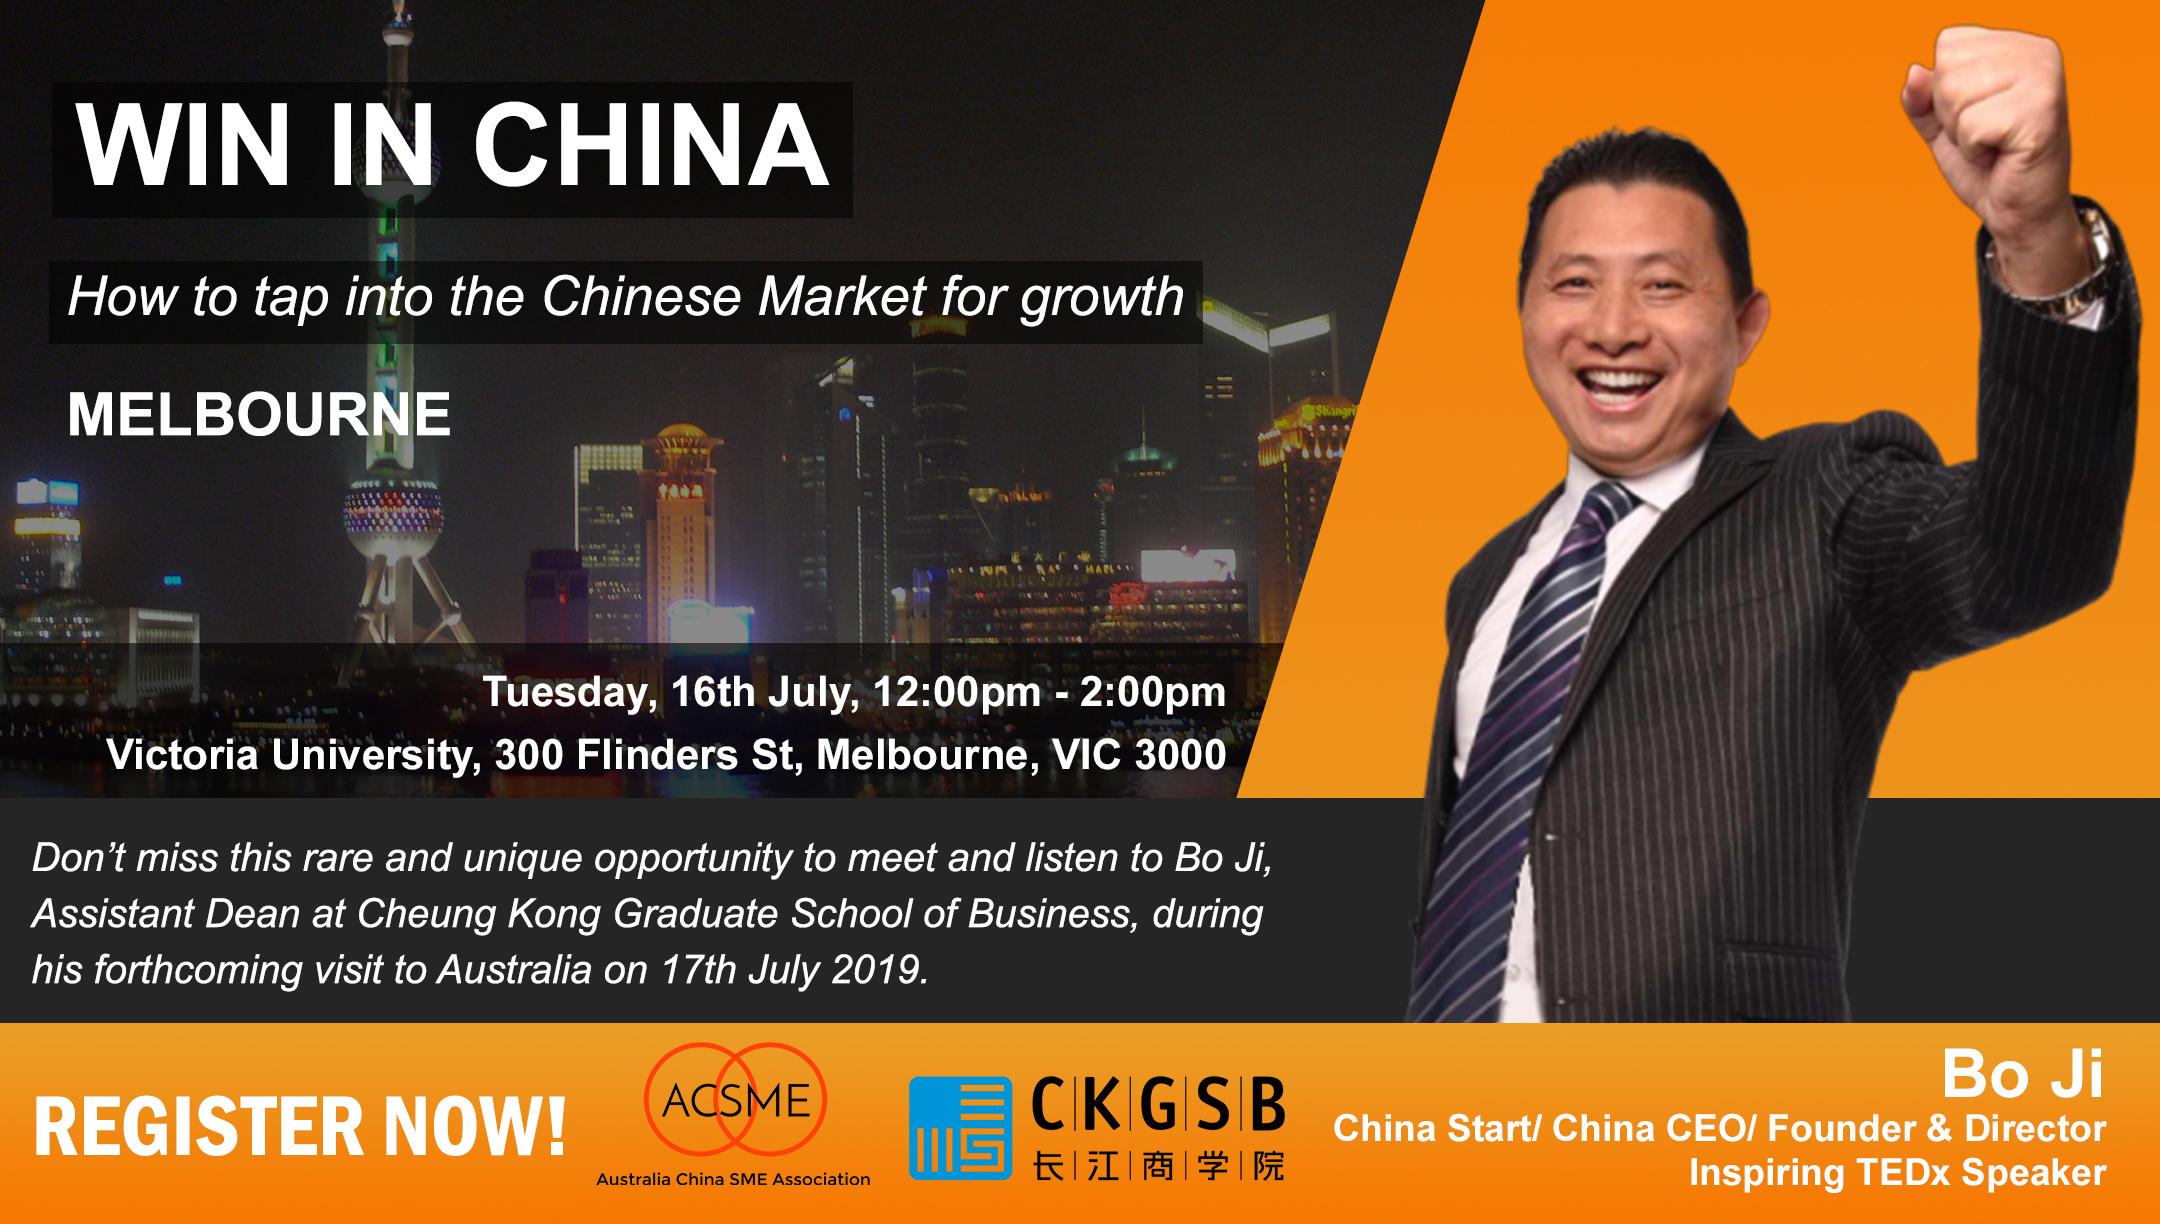 Win in China Melbourne.jpg